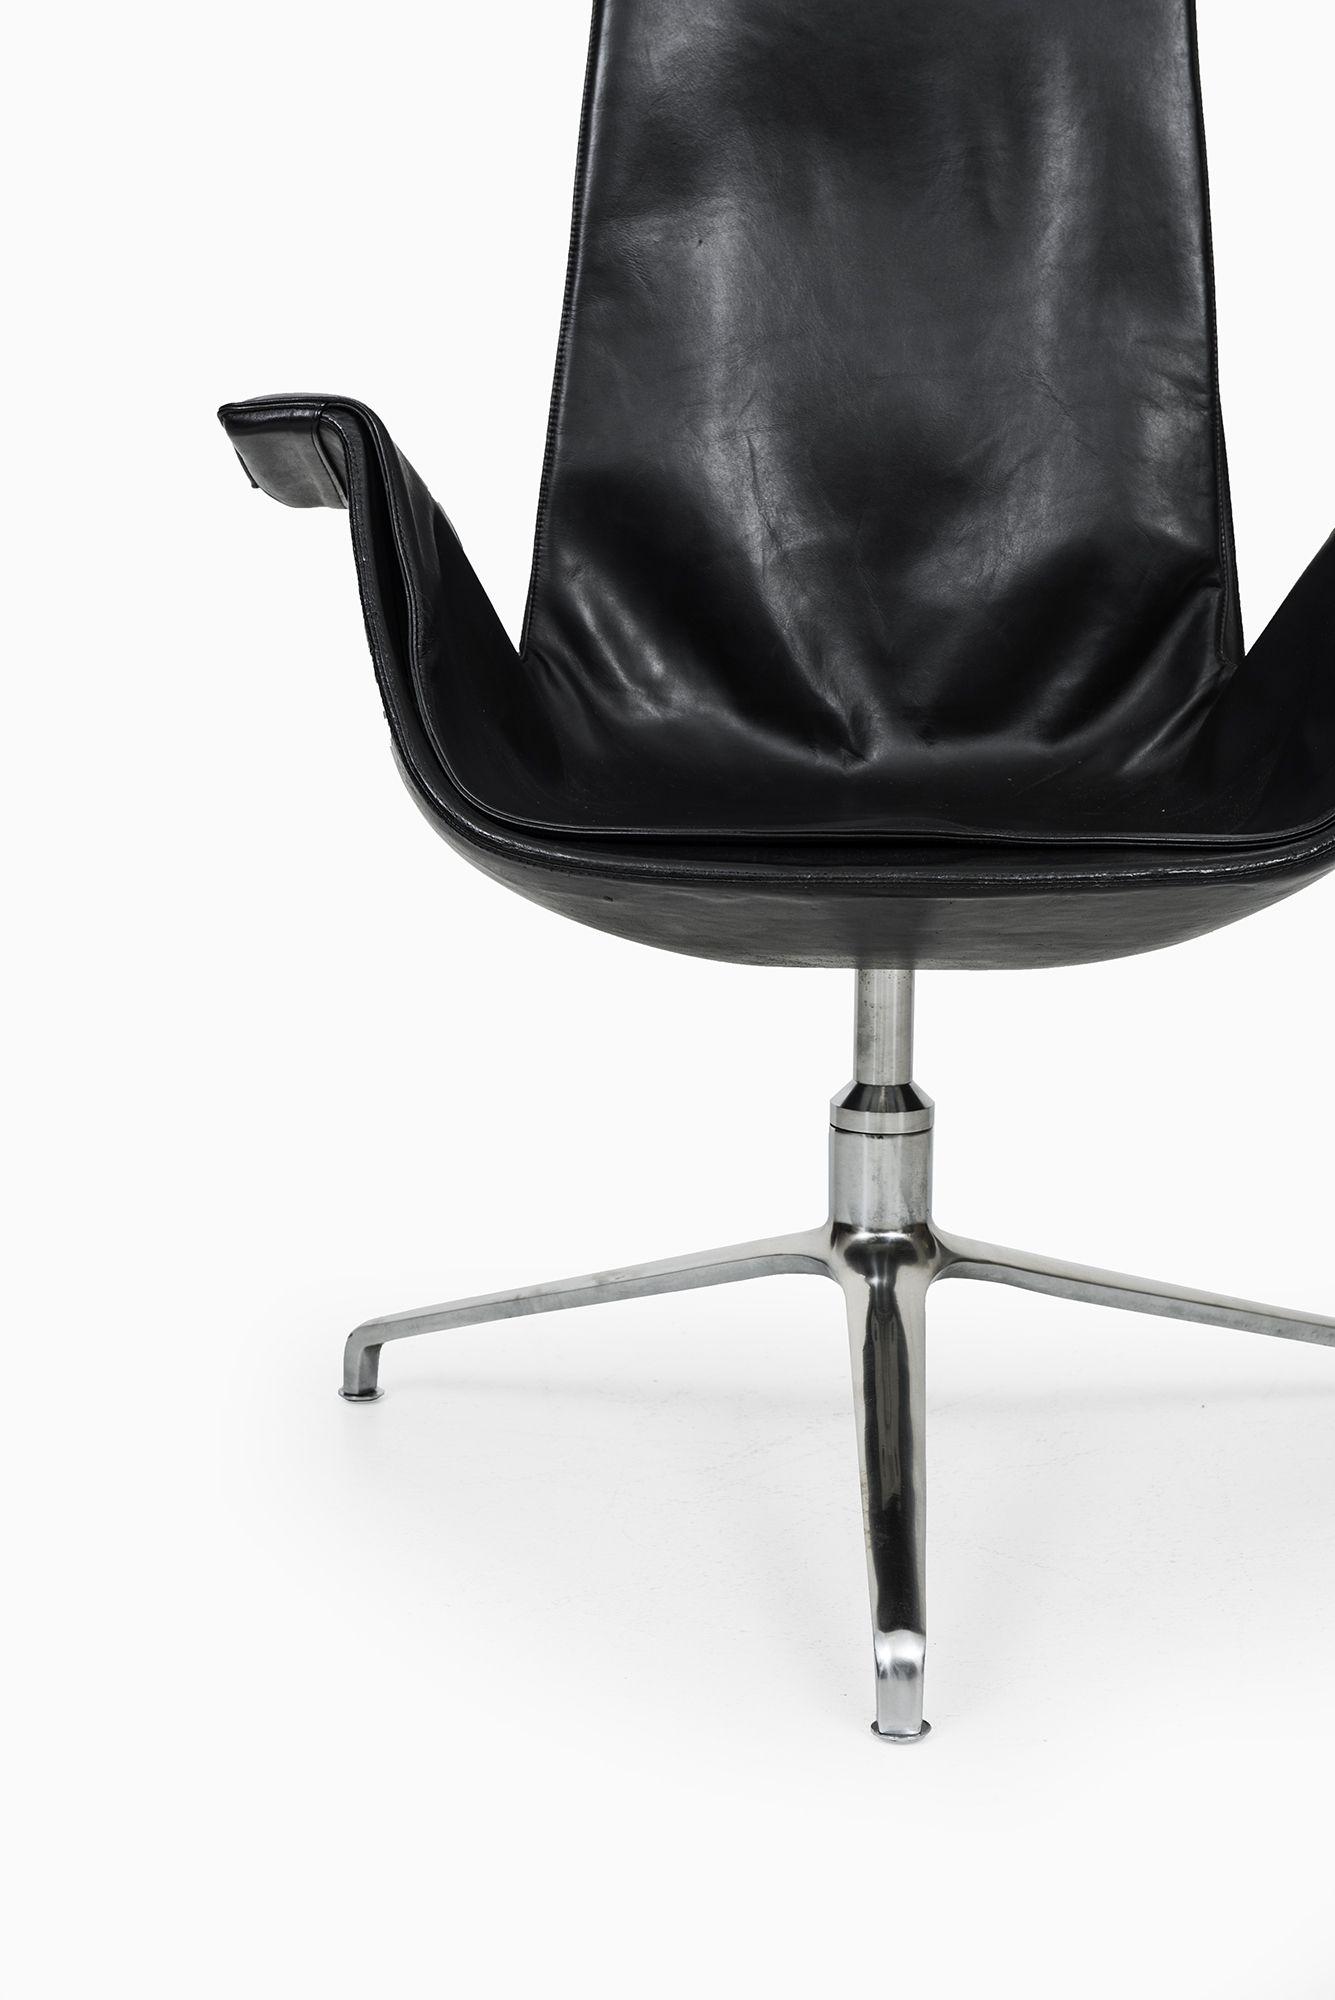 Preben Fabricius & Jørgen Kastholm armchairs model FK6725 at Studio Schalling